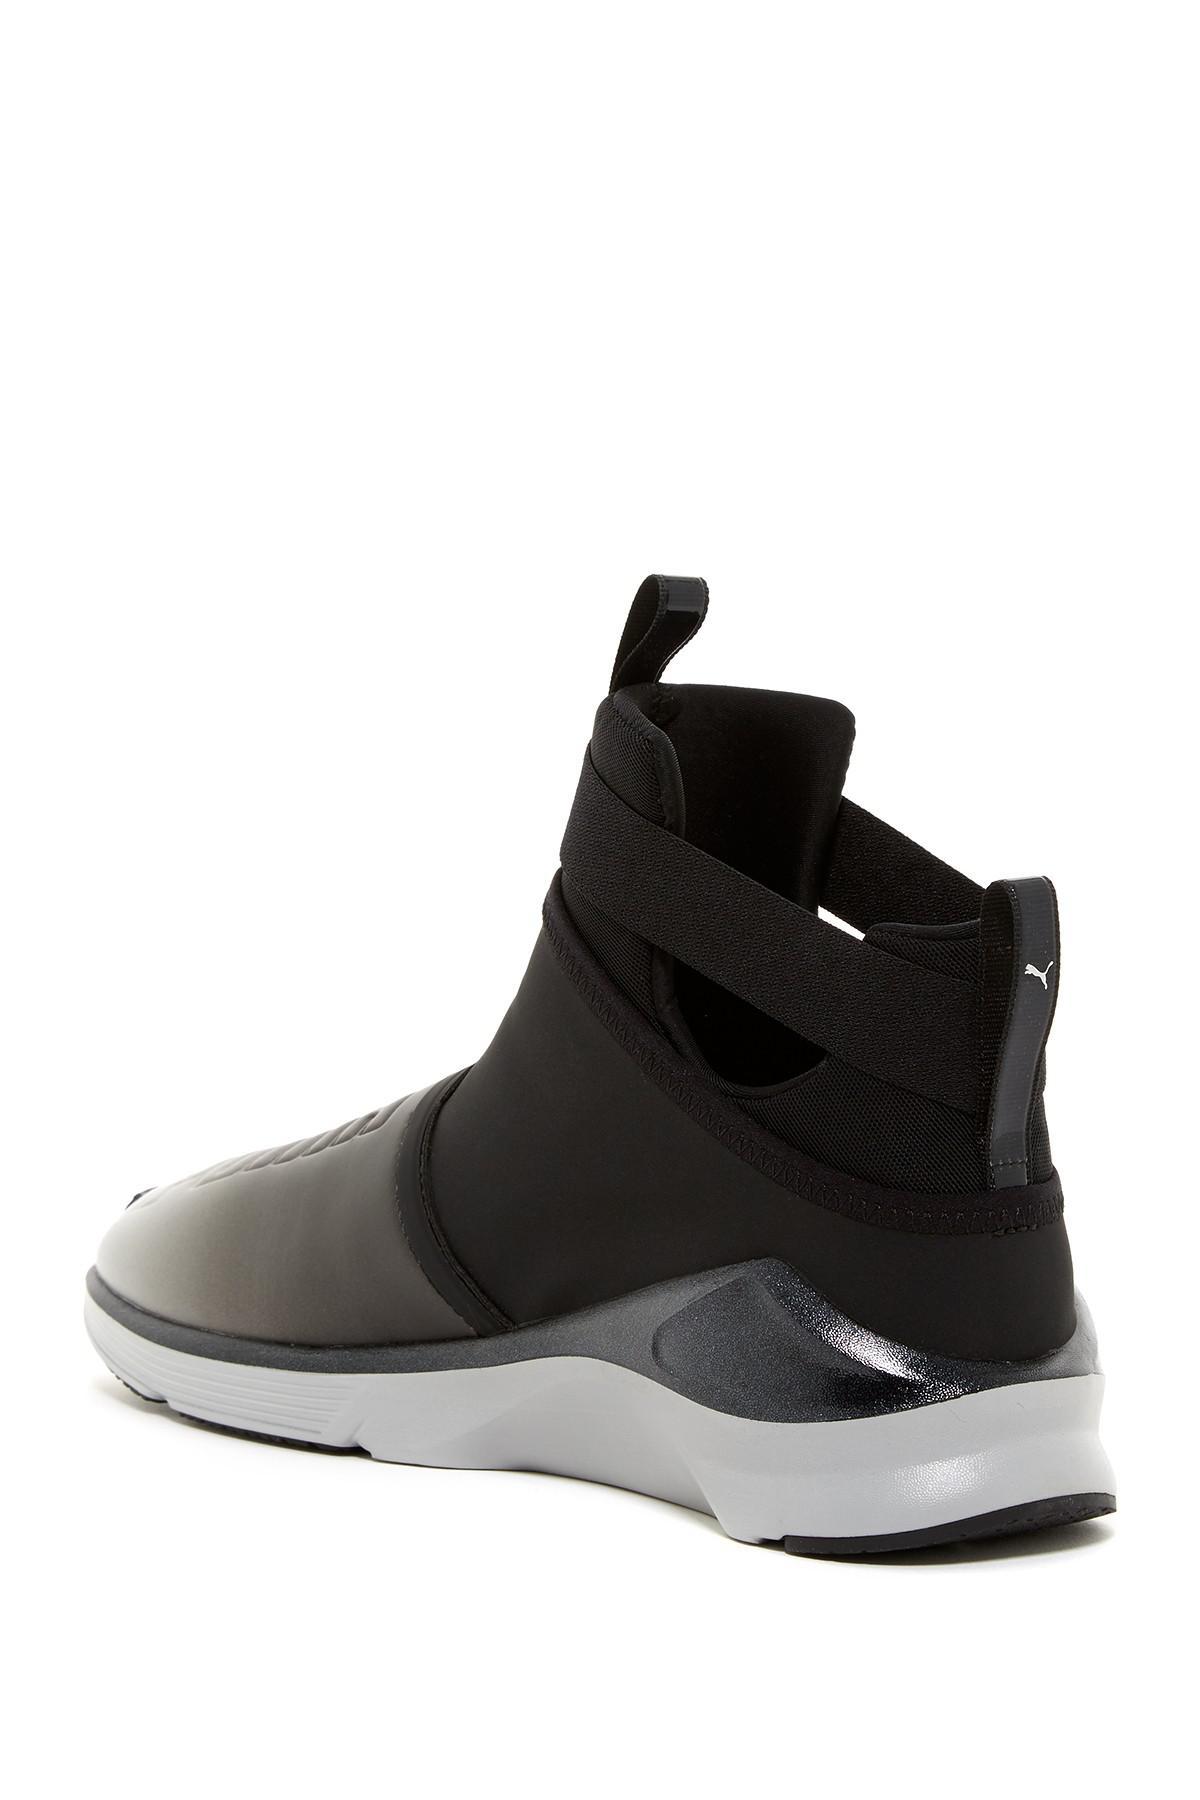 50931685da64 Lyst - PUMA Fierce Strap Metallic Sneaker in Black for Men